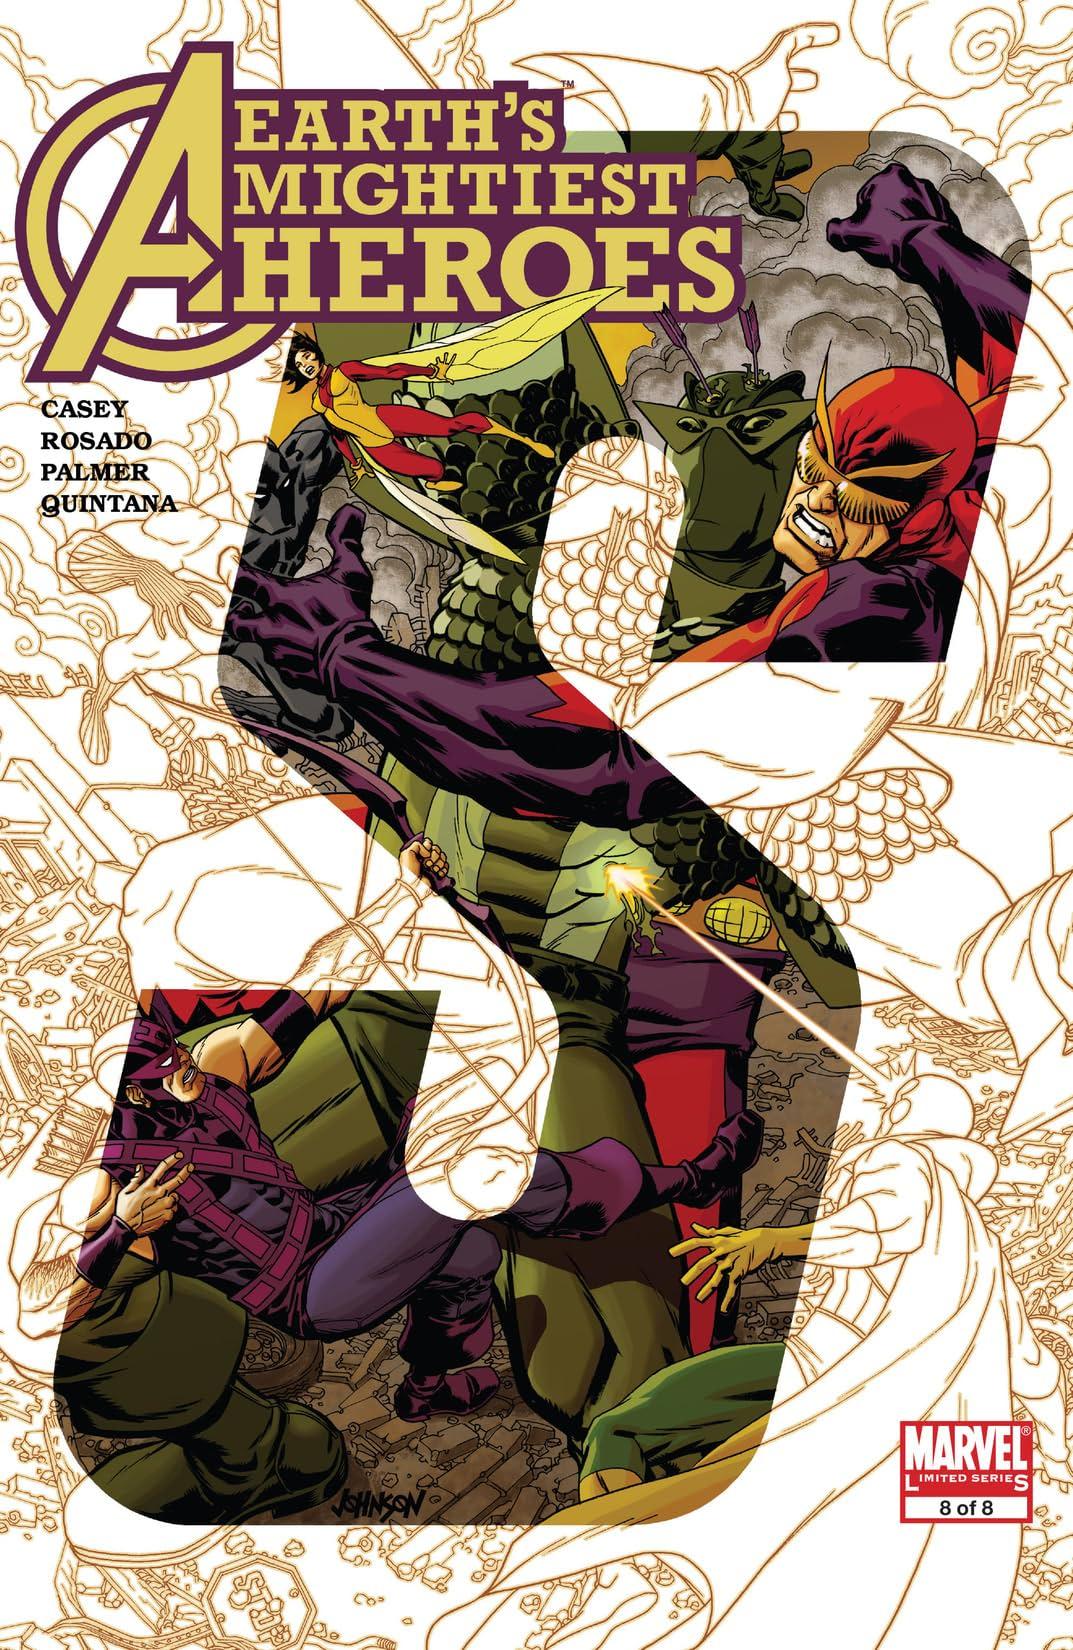 Avengers: Earth's Mightiest Heroes II (2006-2007) #8 (of 8)